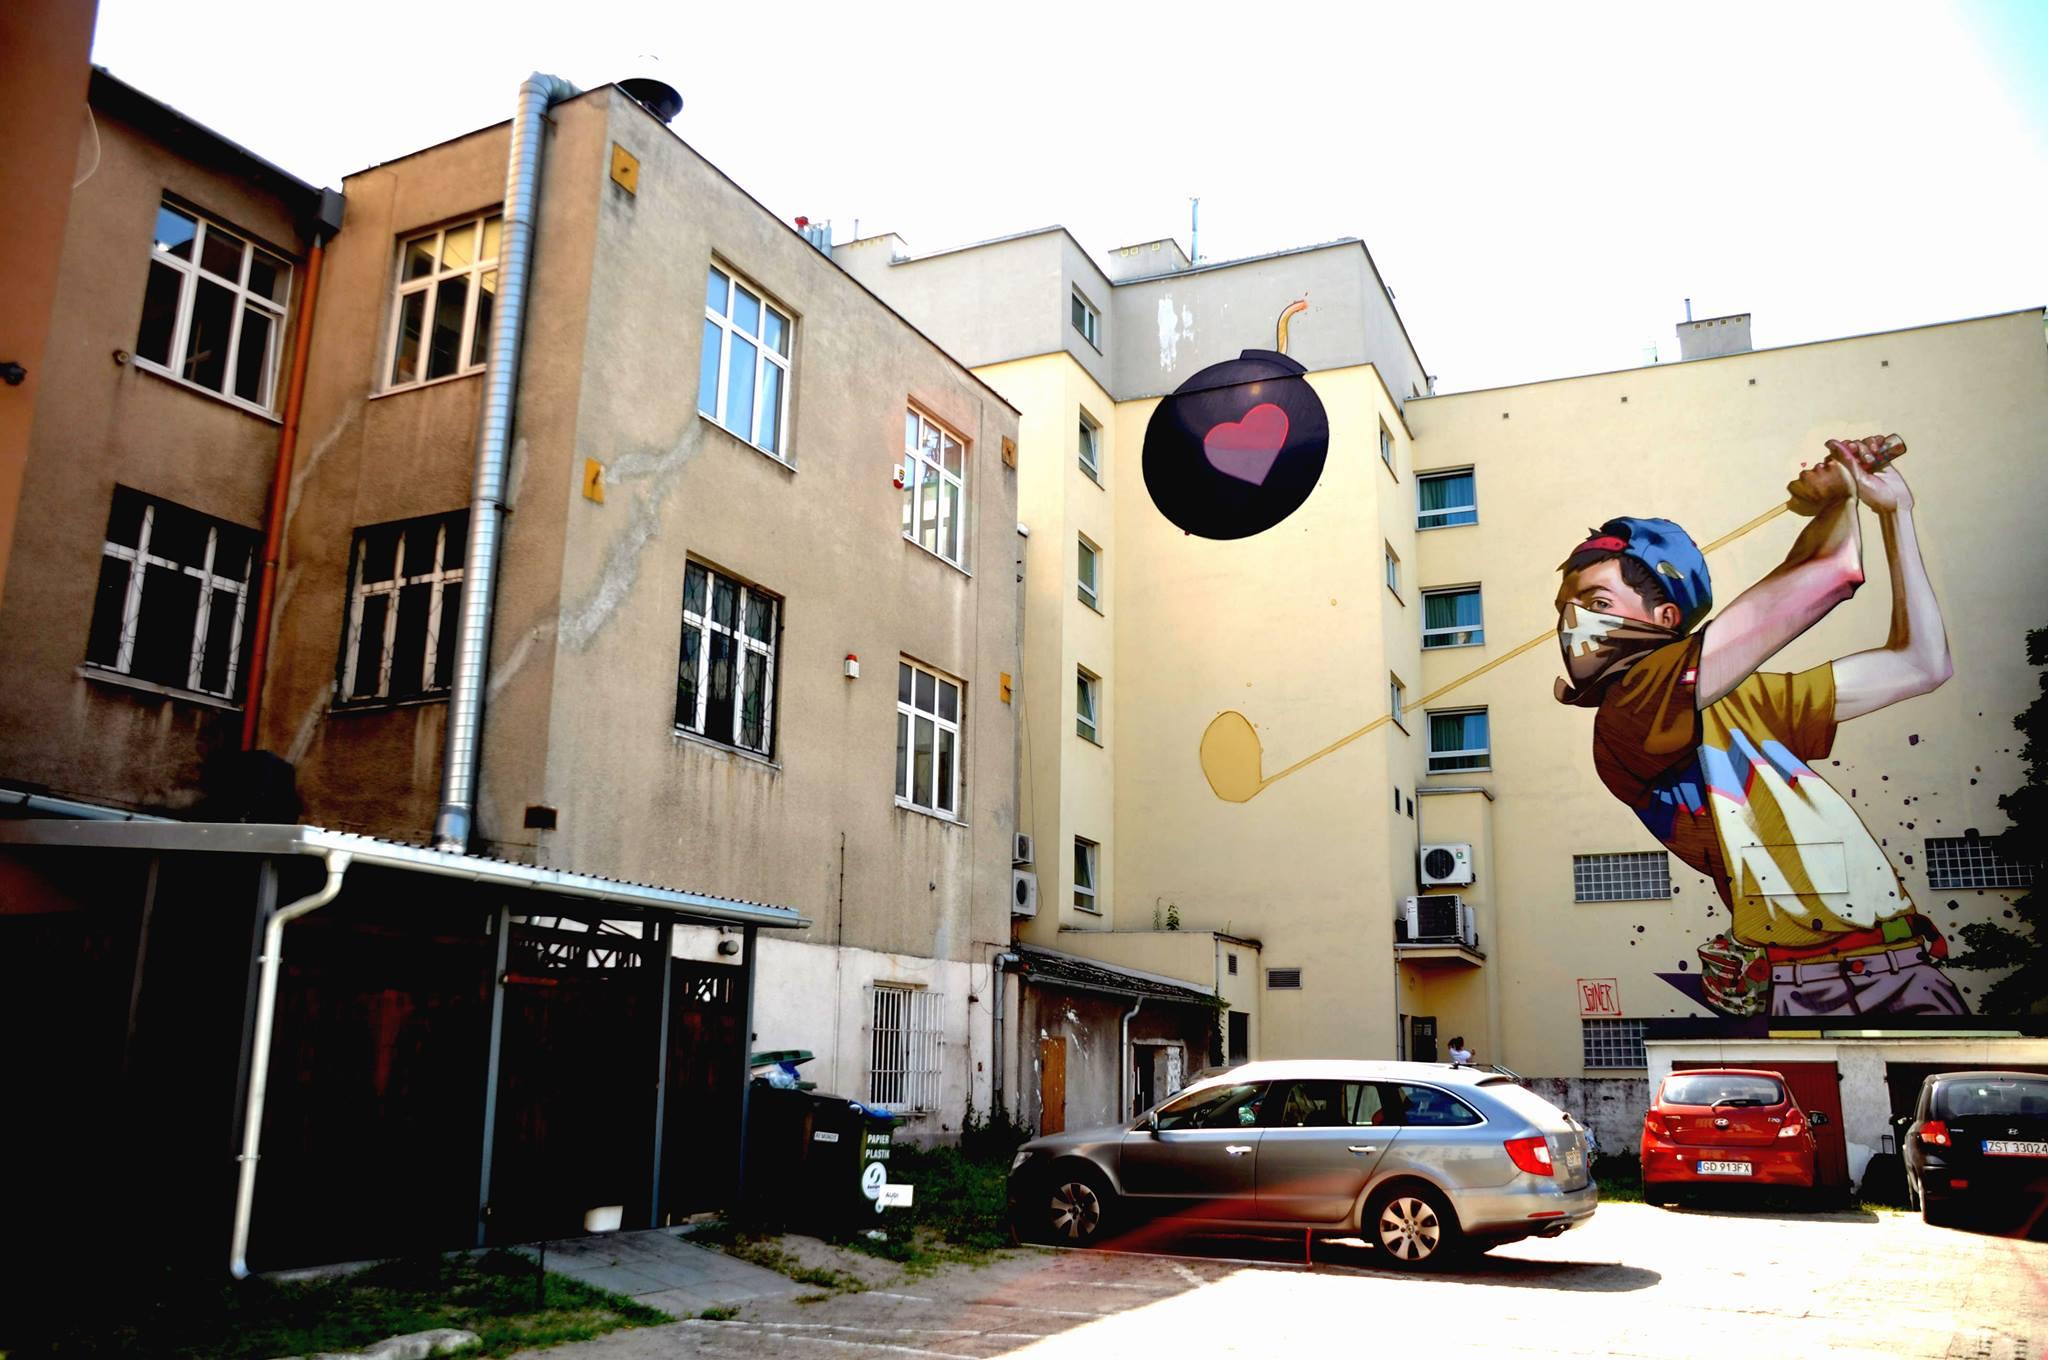 Street-Art-by-SAINER-in-Gdynia-Poland.jpg